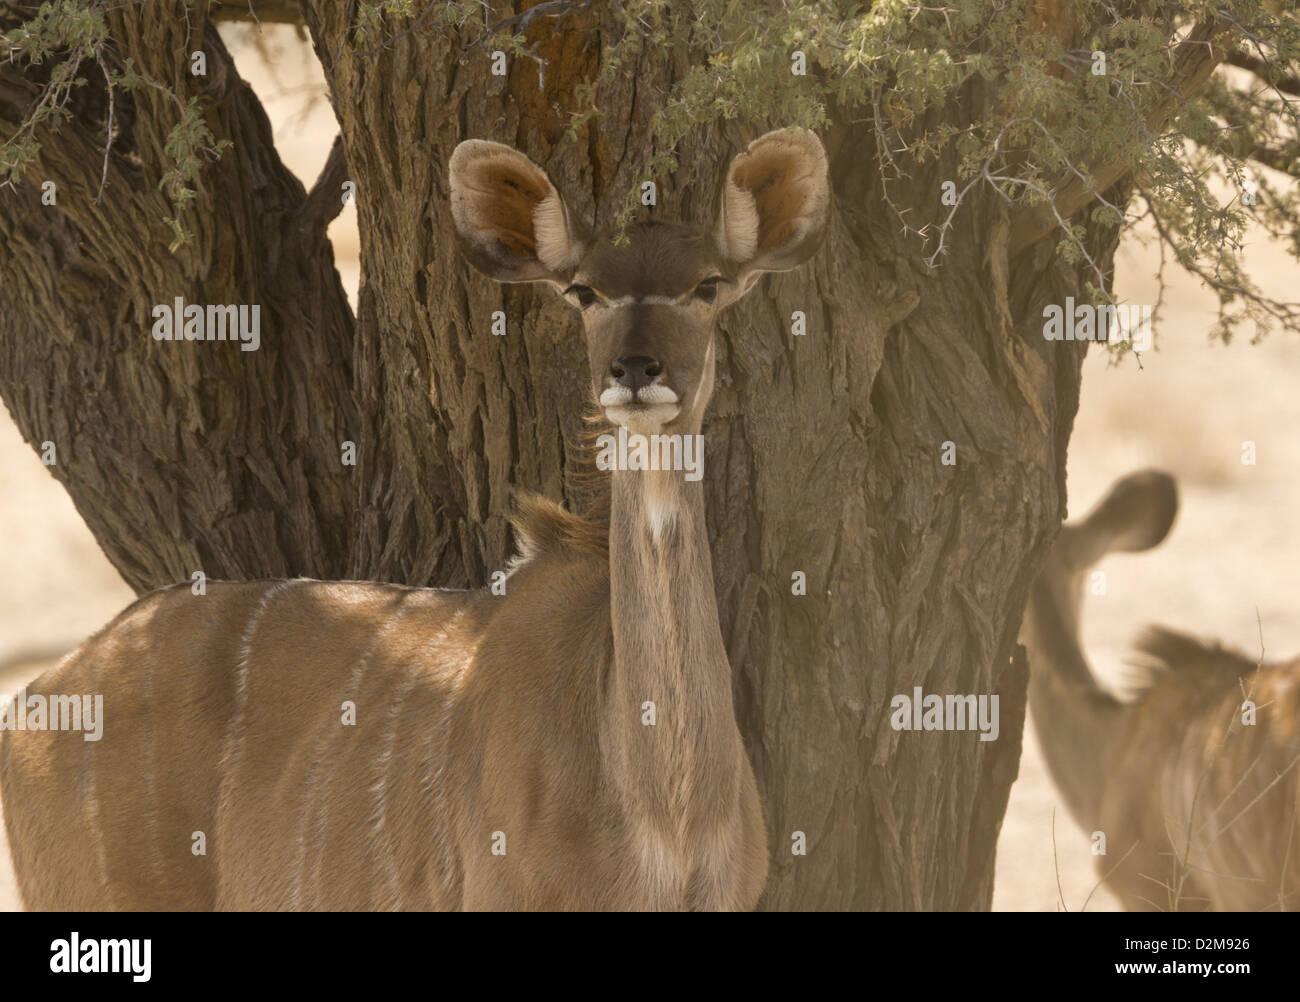 Female Greater Kudu (Tragelaphus strepsiceros) in the Kalahari Desert, South Africa - Stock Image